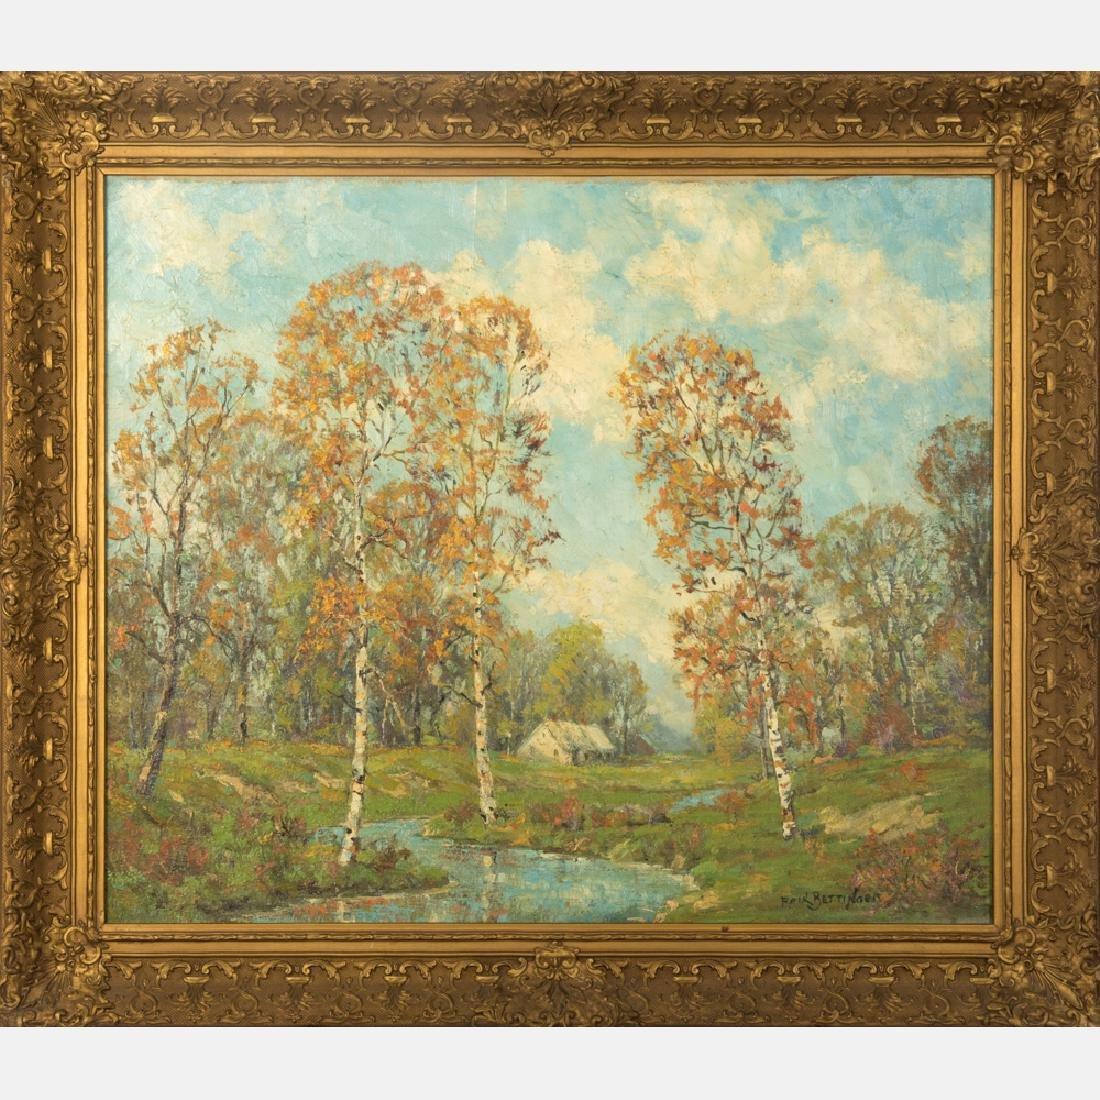 Paul Bettinger (American, 1878-1947) River Landscape,